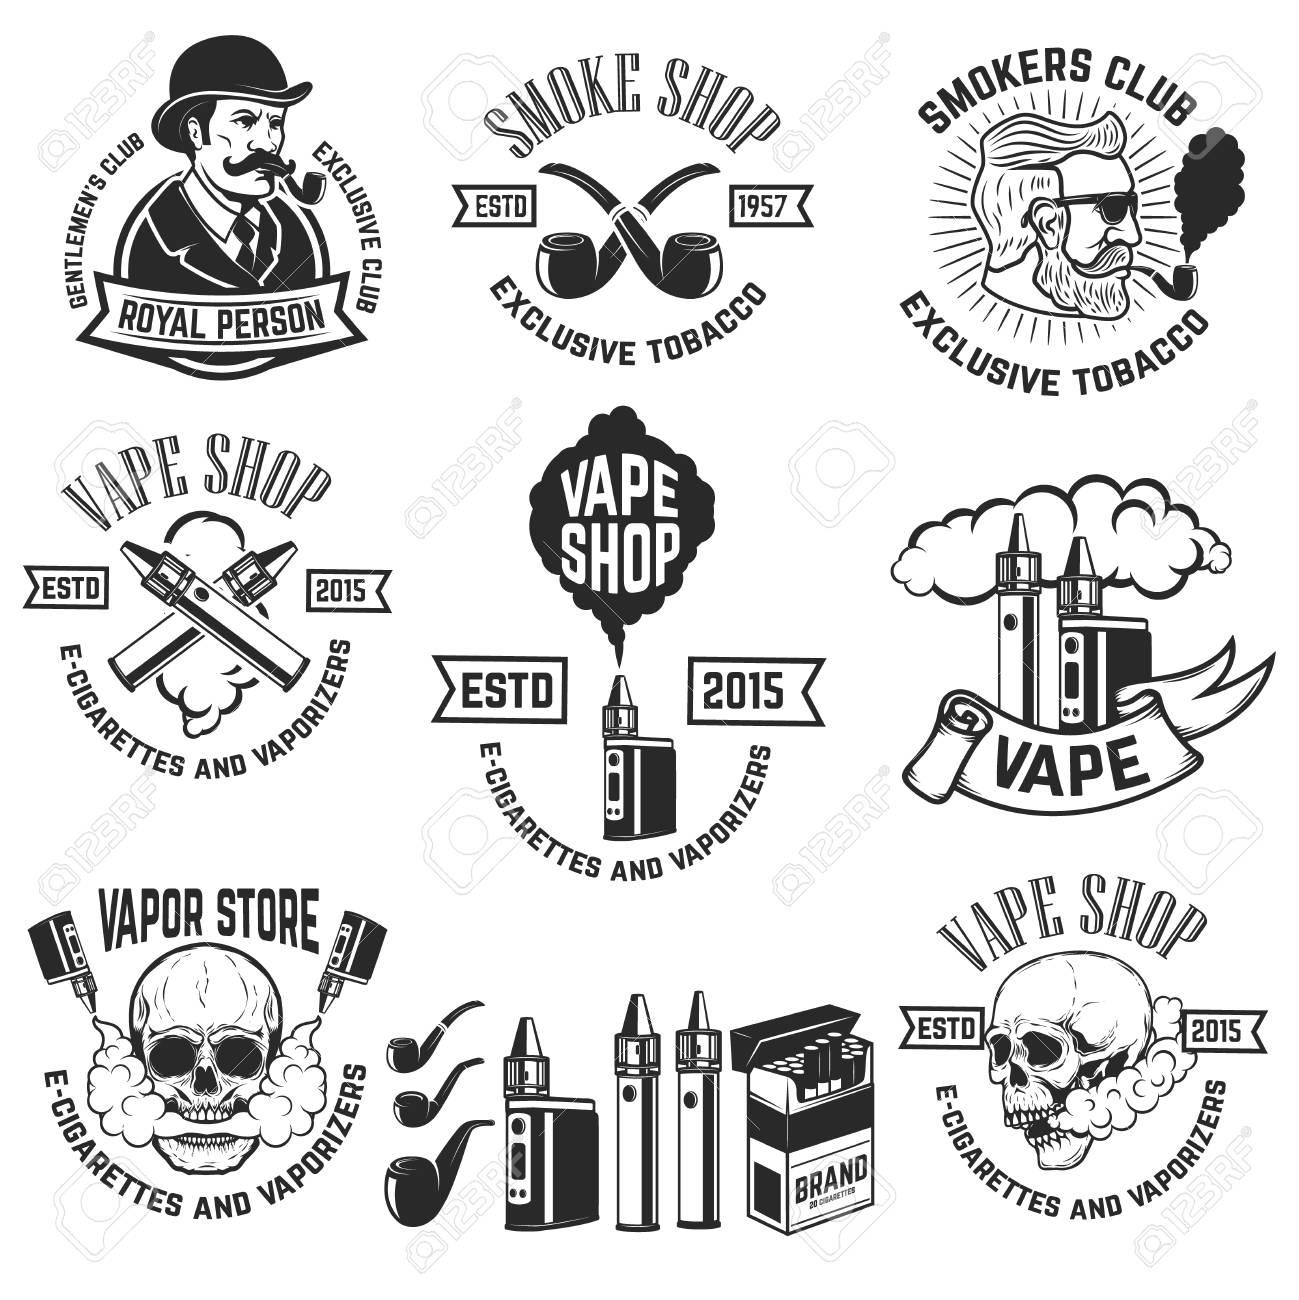 Set Of Vape Shop Emblem Templates. Smoke Shop. Design Elements ...